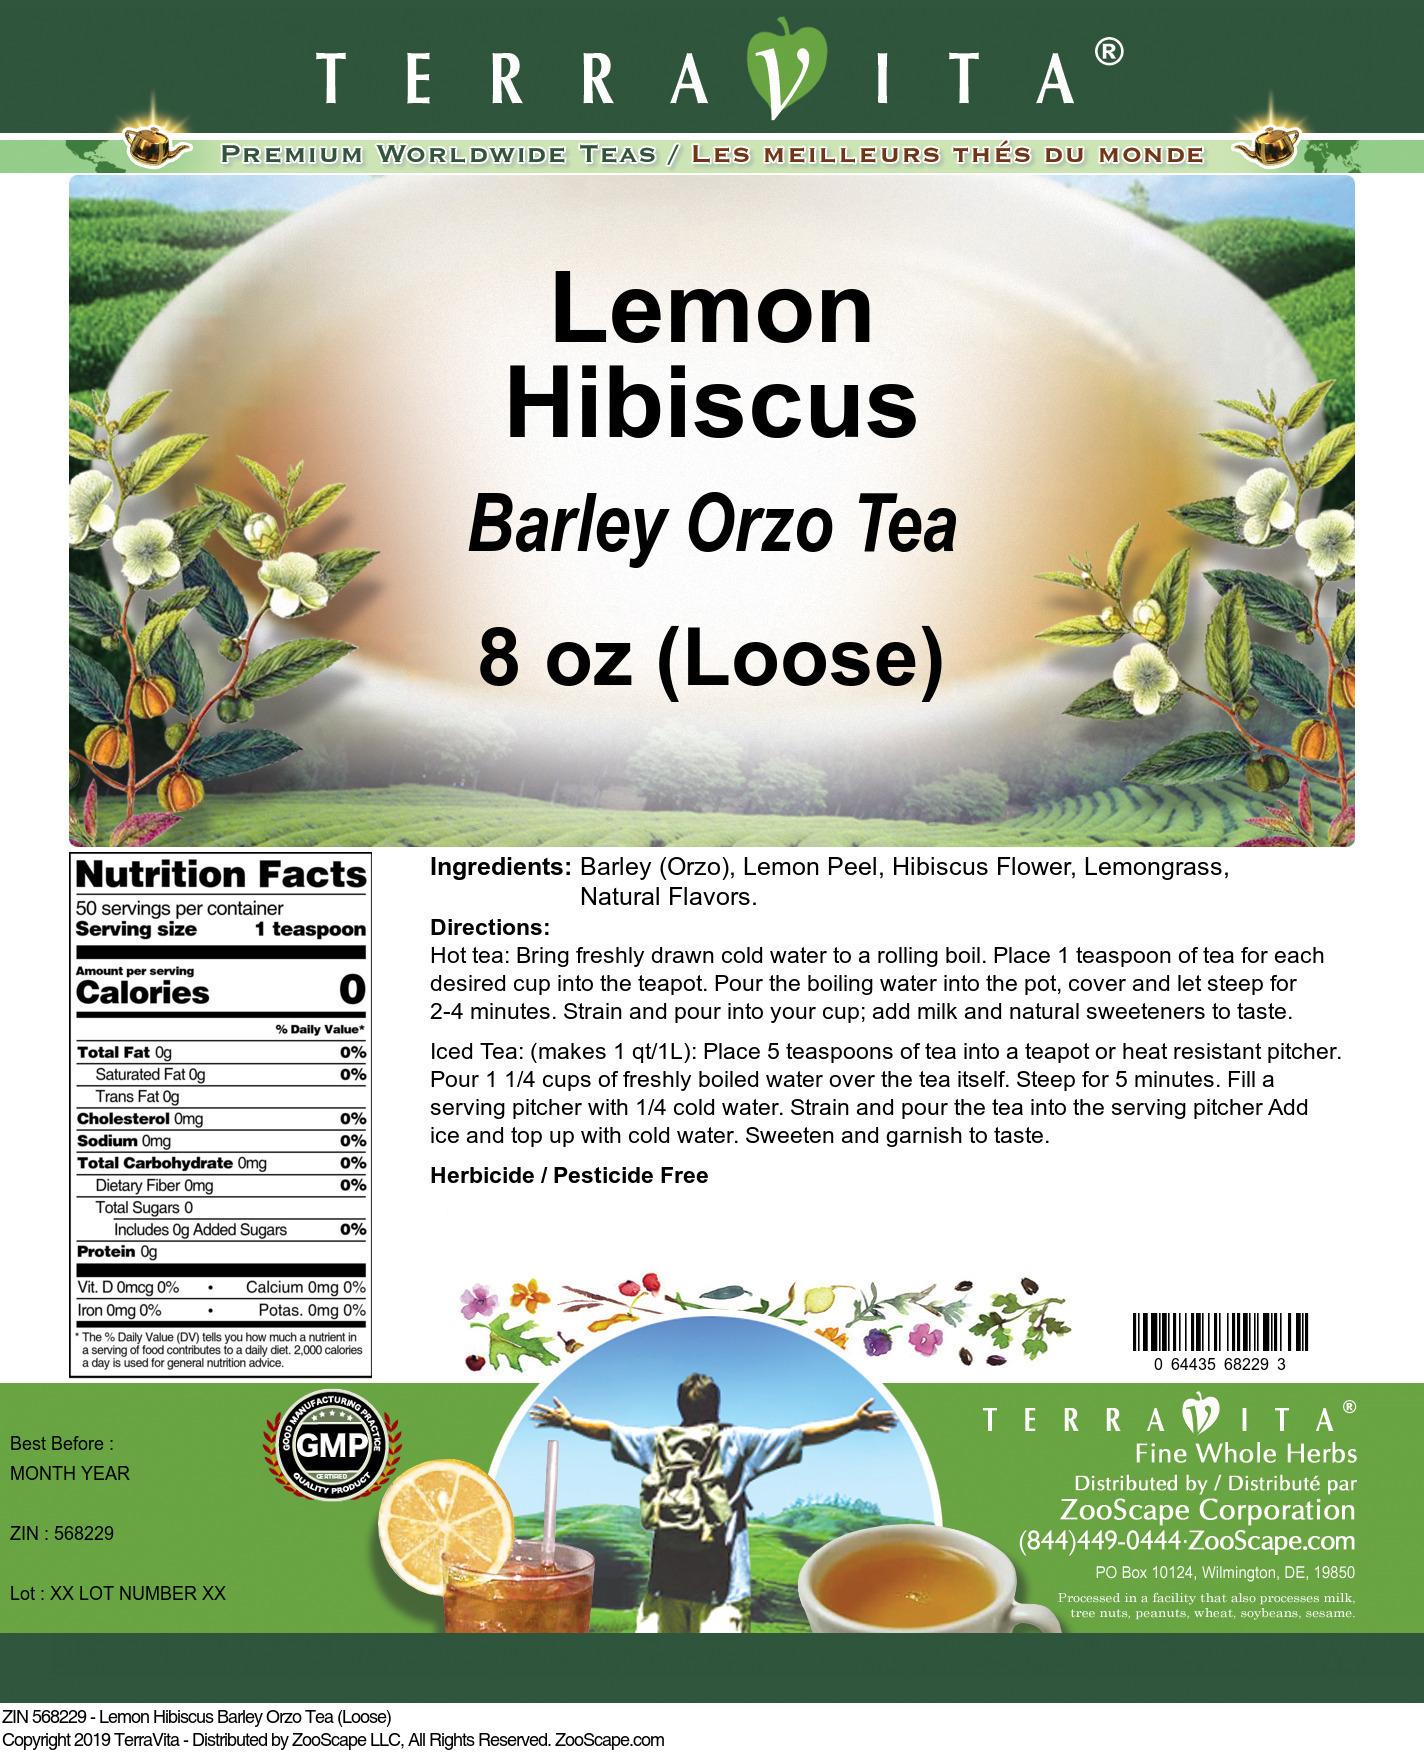 Lemon Hibiscus Barley Orzo Tea (Loose)